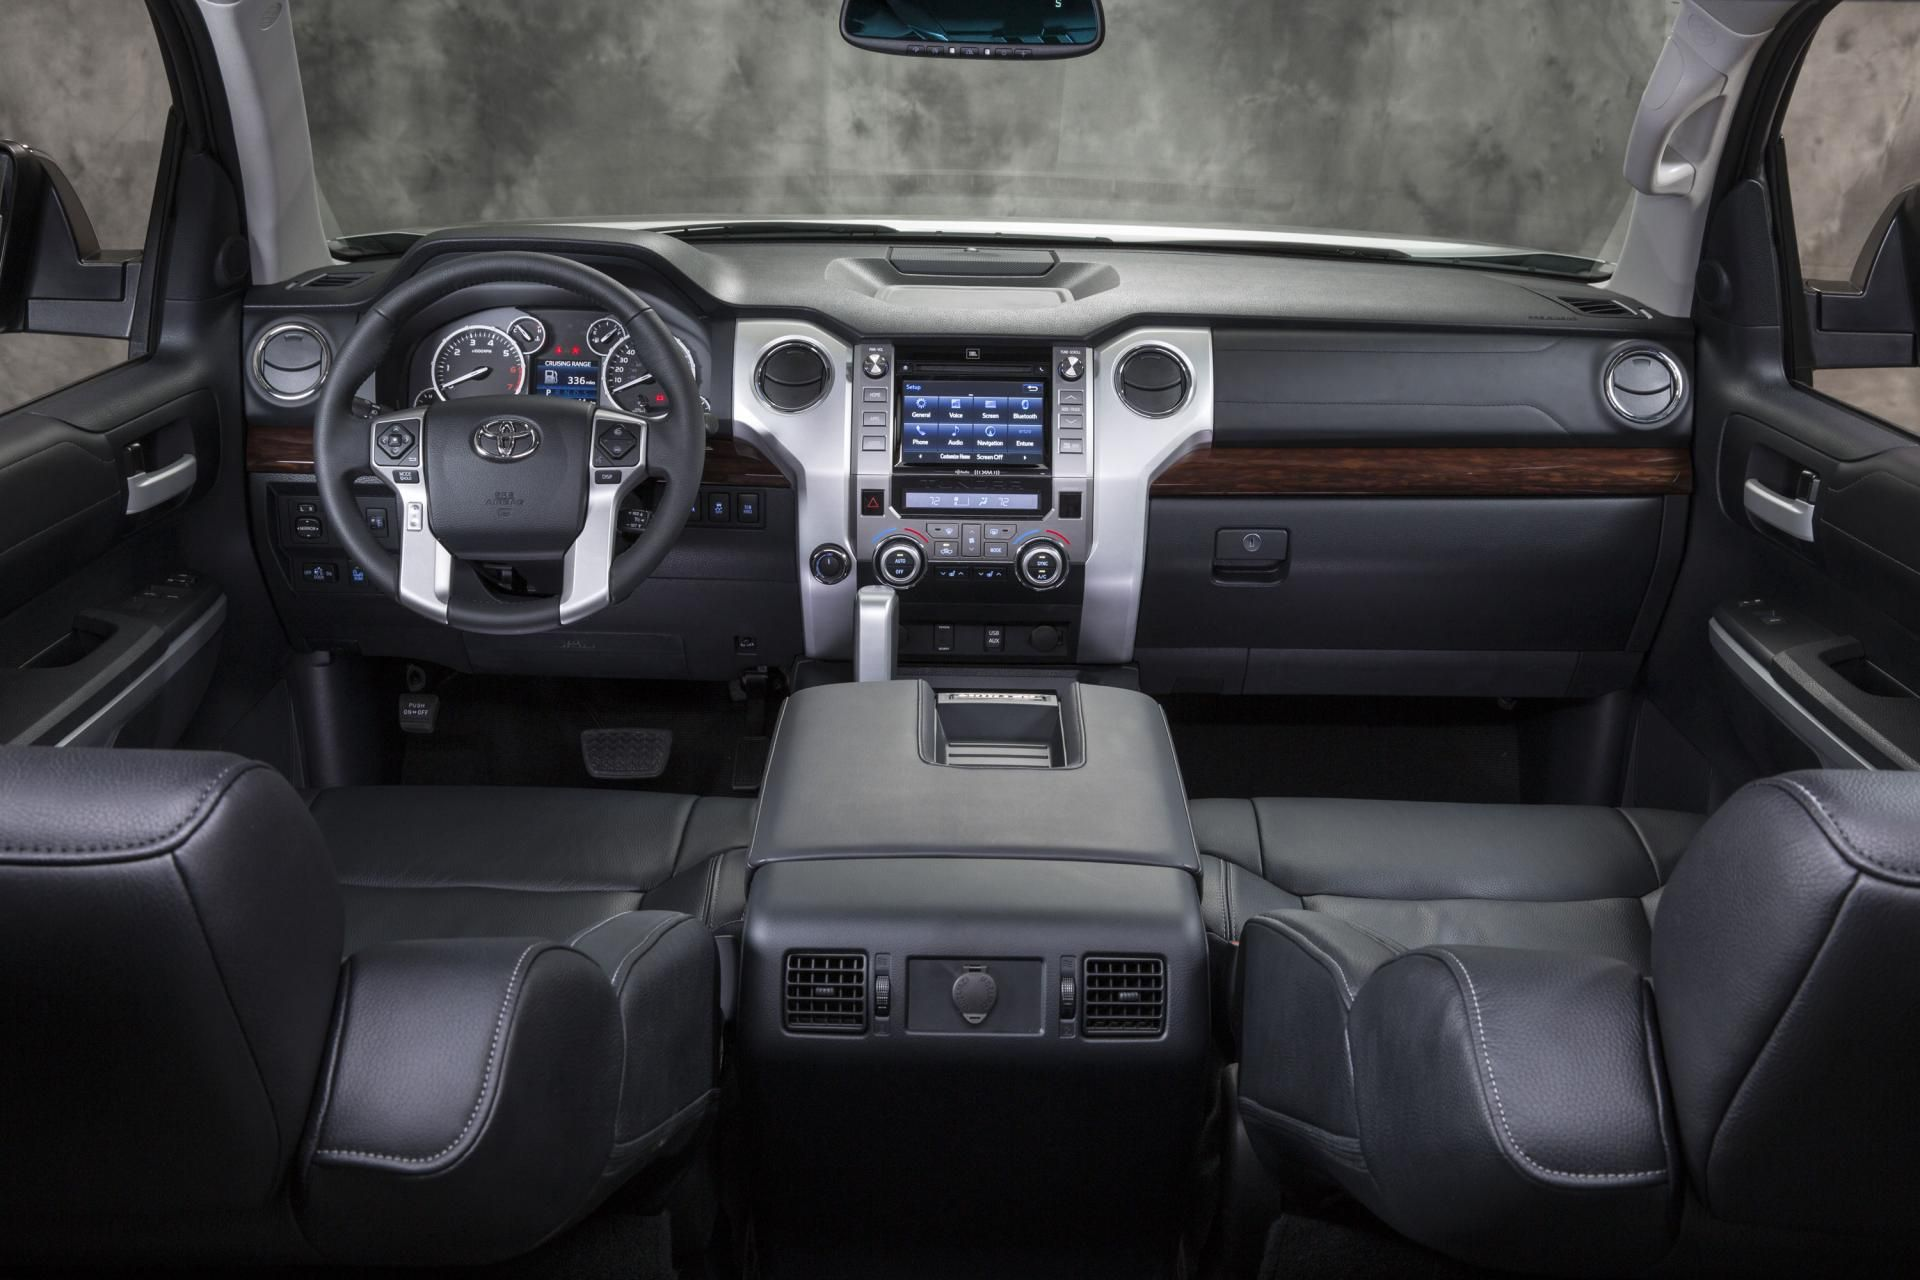 Toyota Tundra 2017 Interior